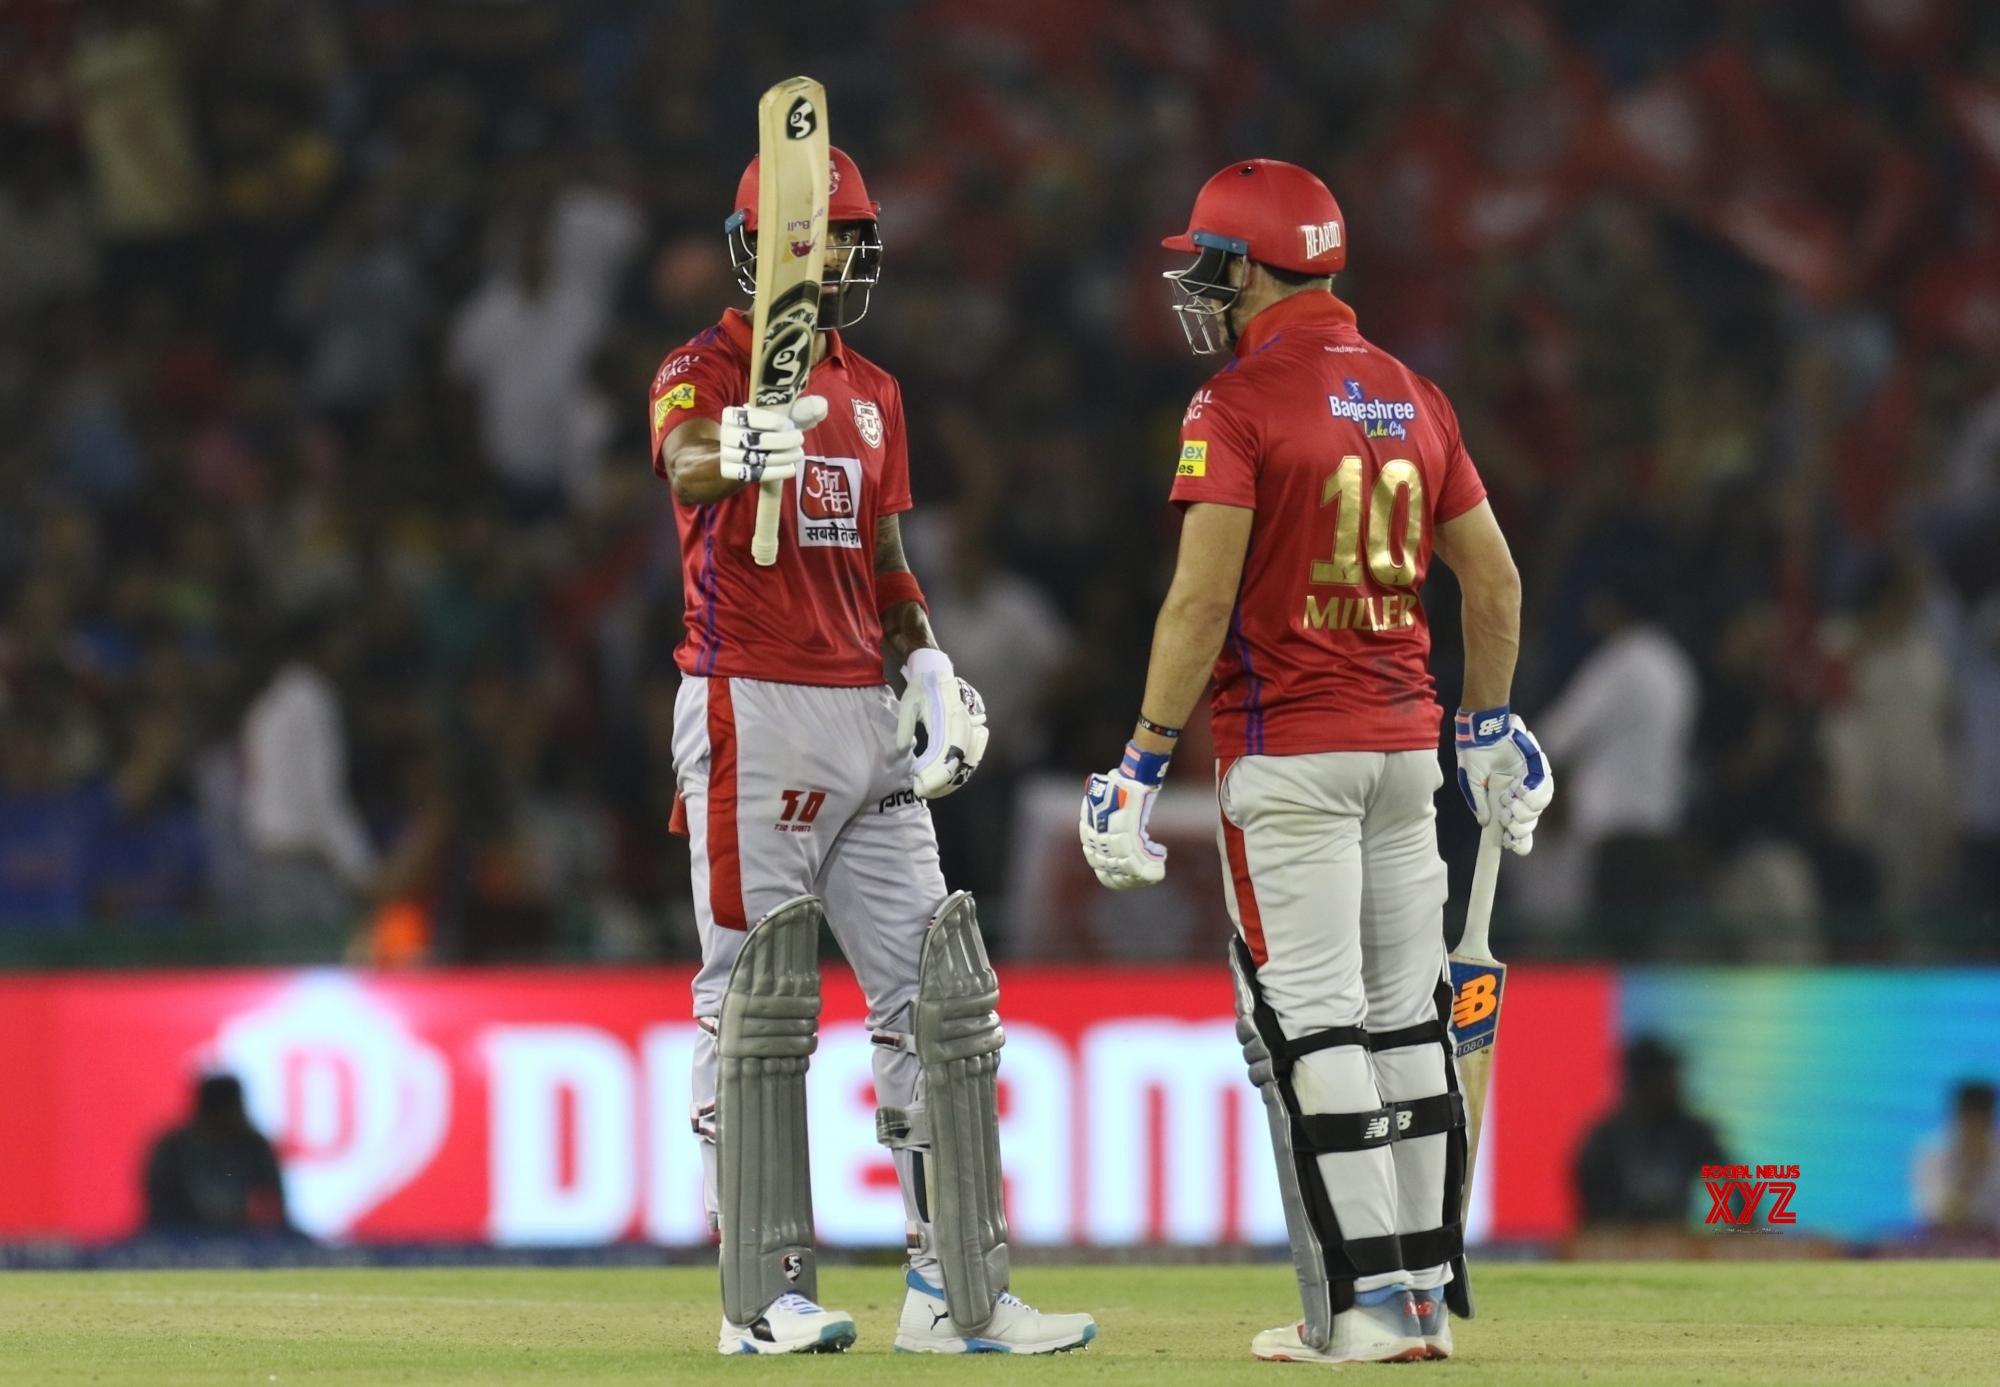 Mohali: IPL 2019 - Match 32 - Kings XI Punjab Vs Rajasthan Royals (Batch - 14) #Gallery